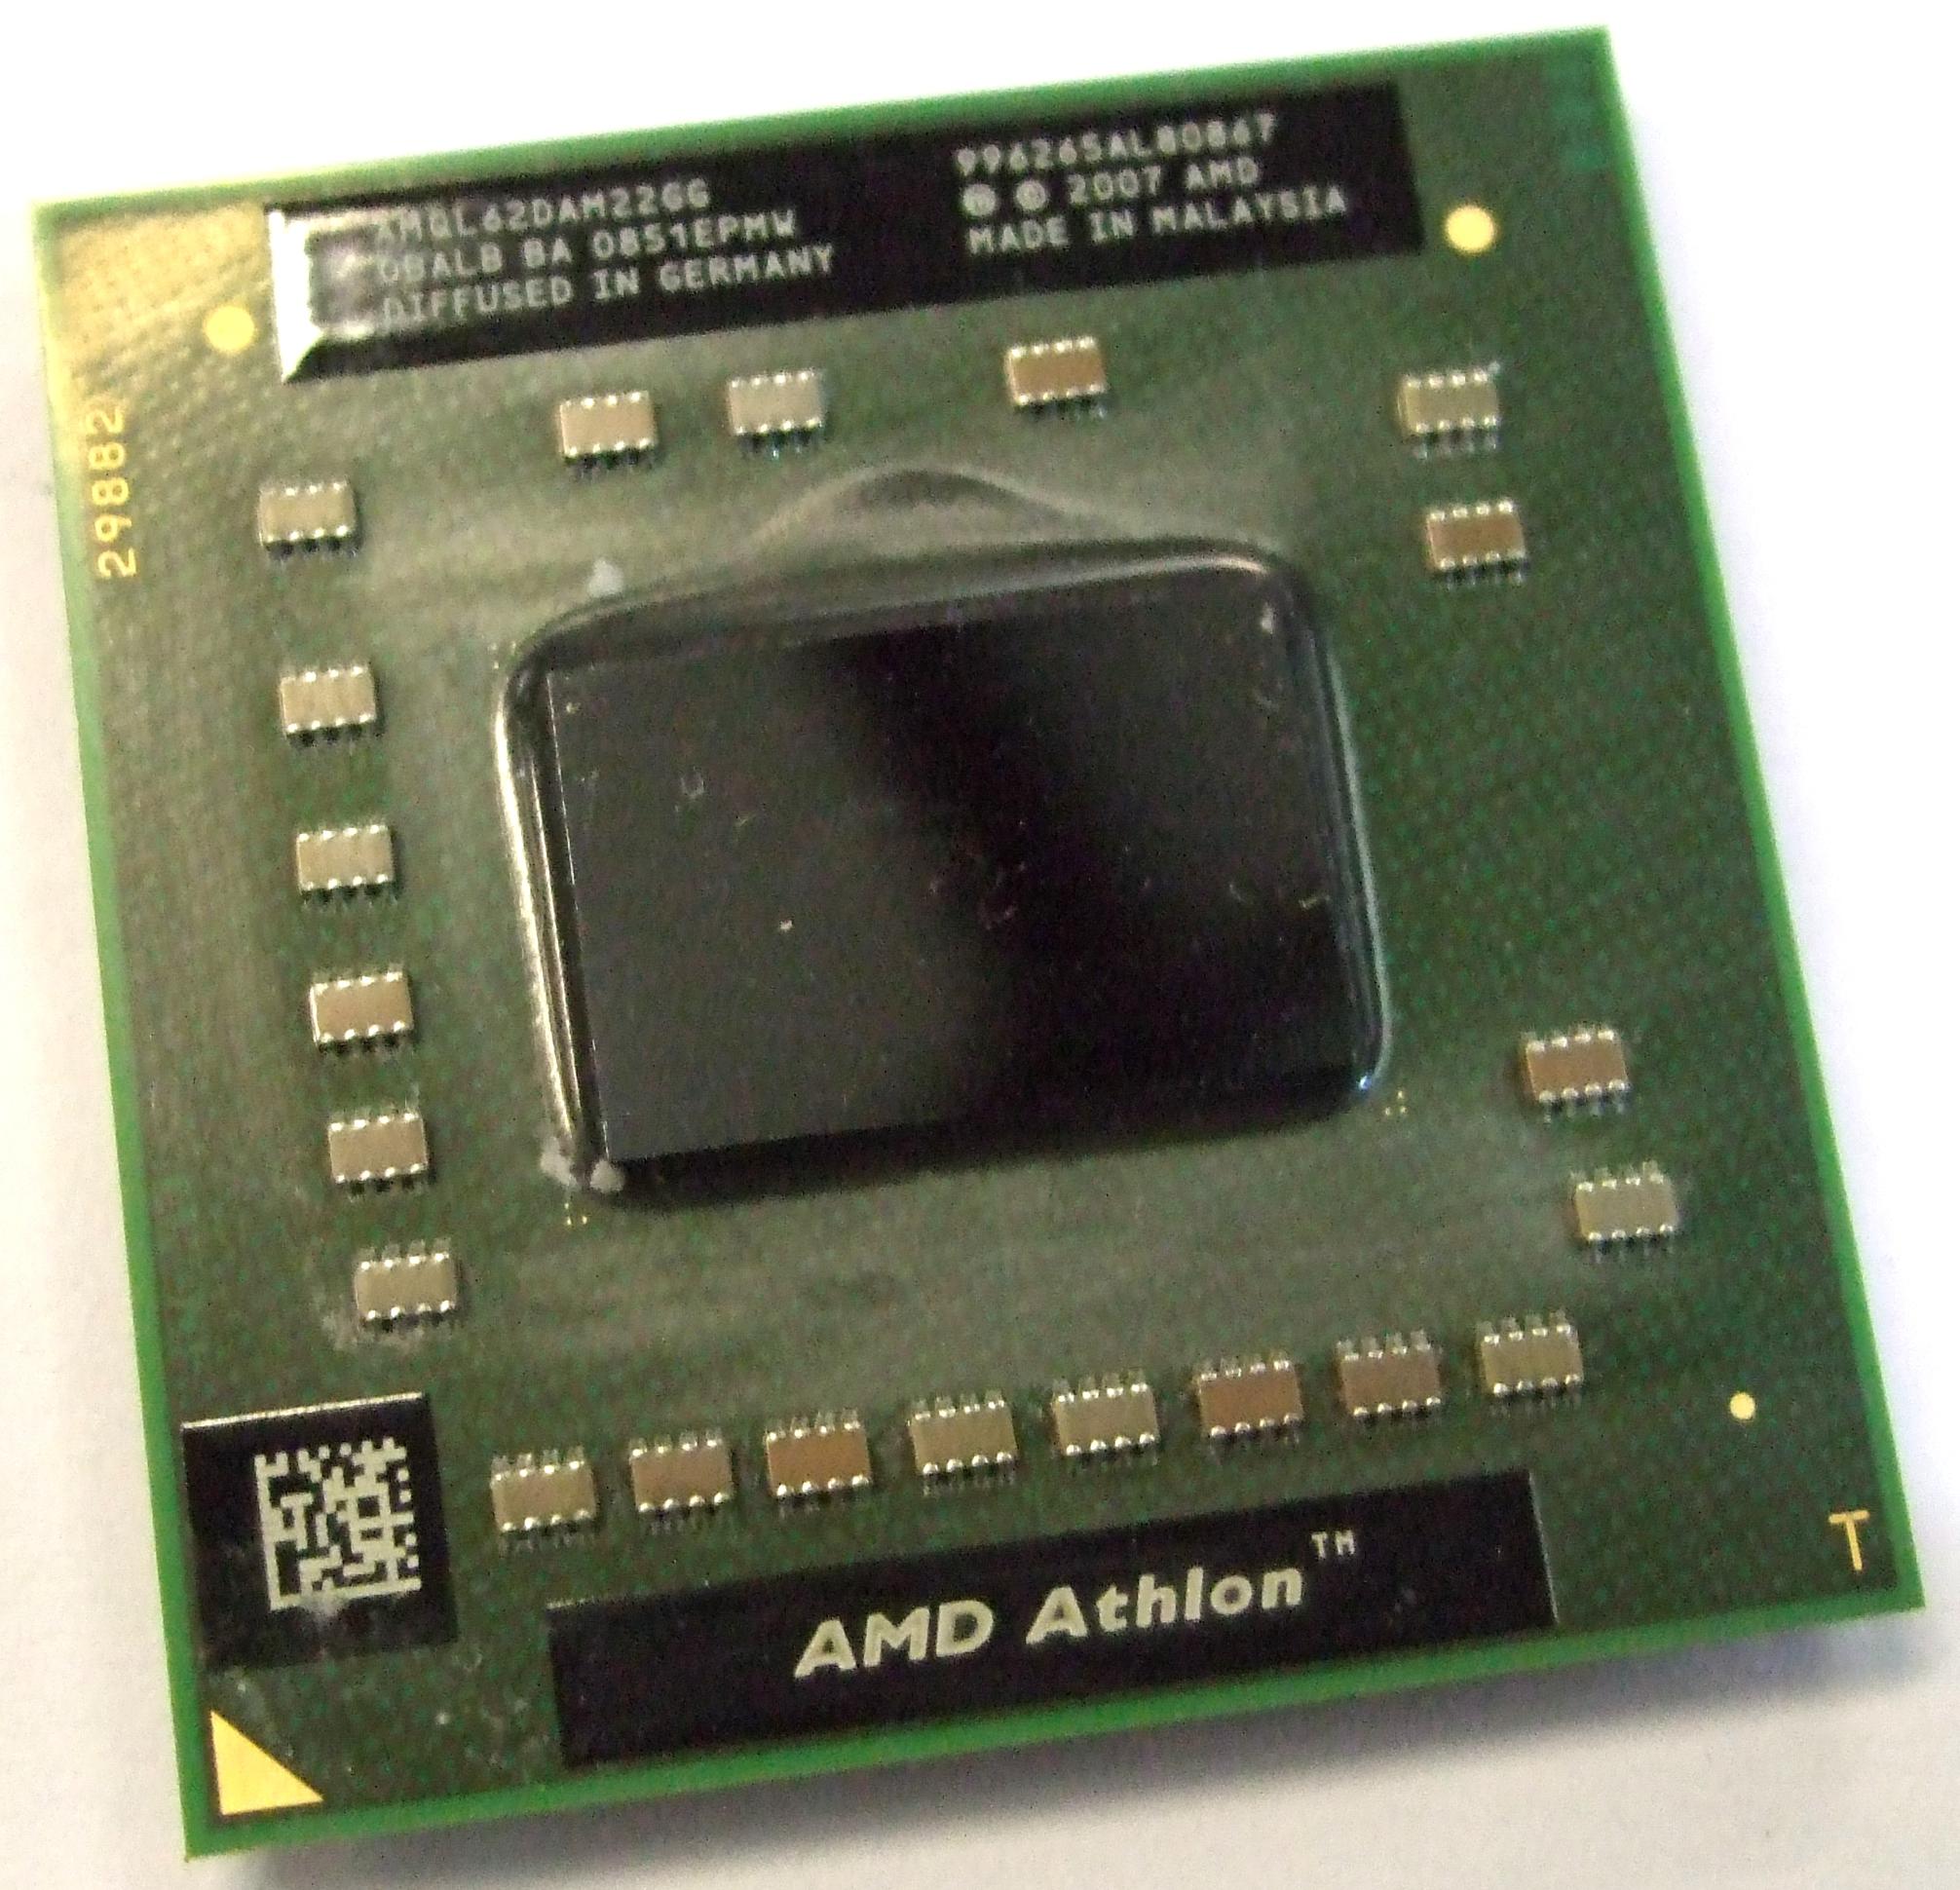 1280x1024 amd athlon 64 - photo #31